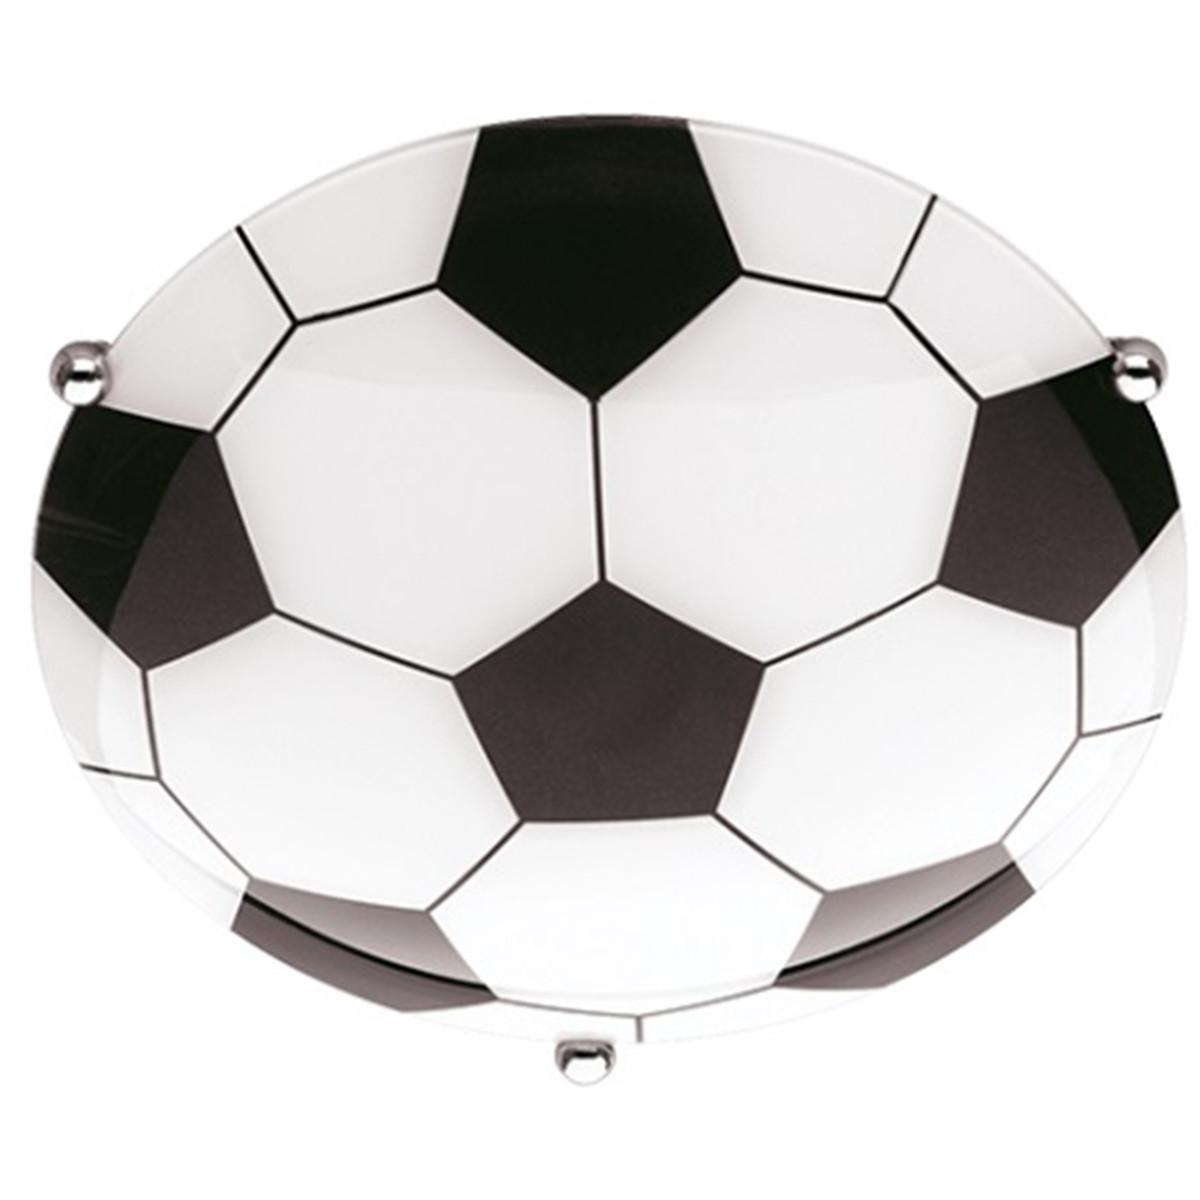 LED Plafondlamp - Plafondverlichting - Trion Cila - E27 Fitting - Rond - Mat Grijs - Aluminium